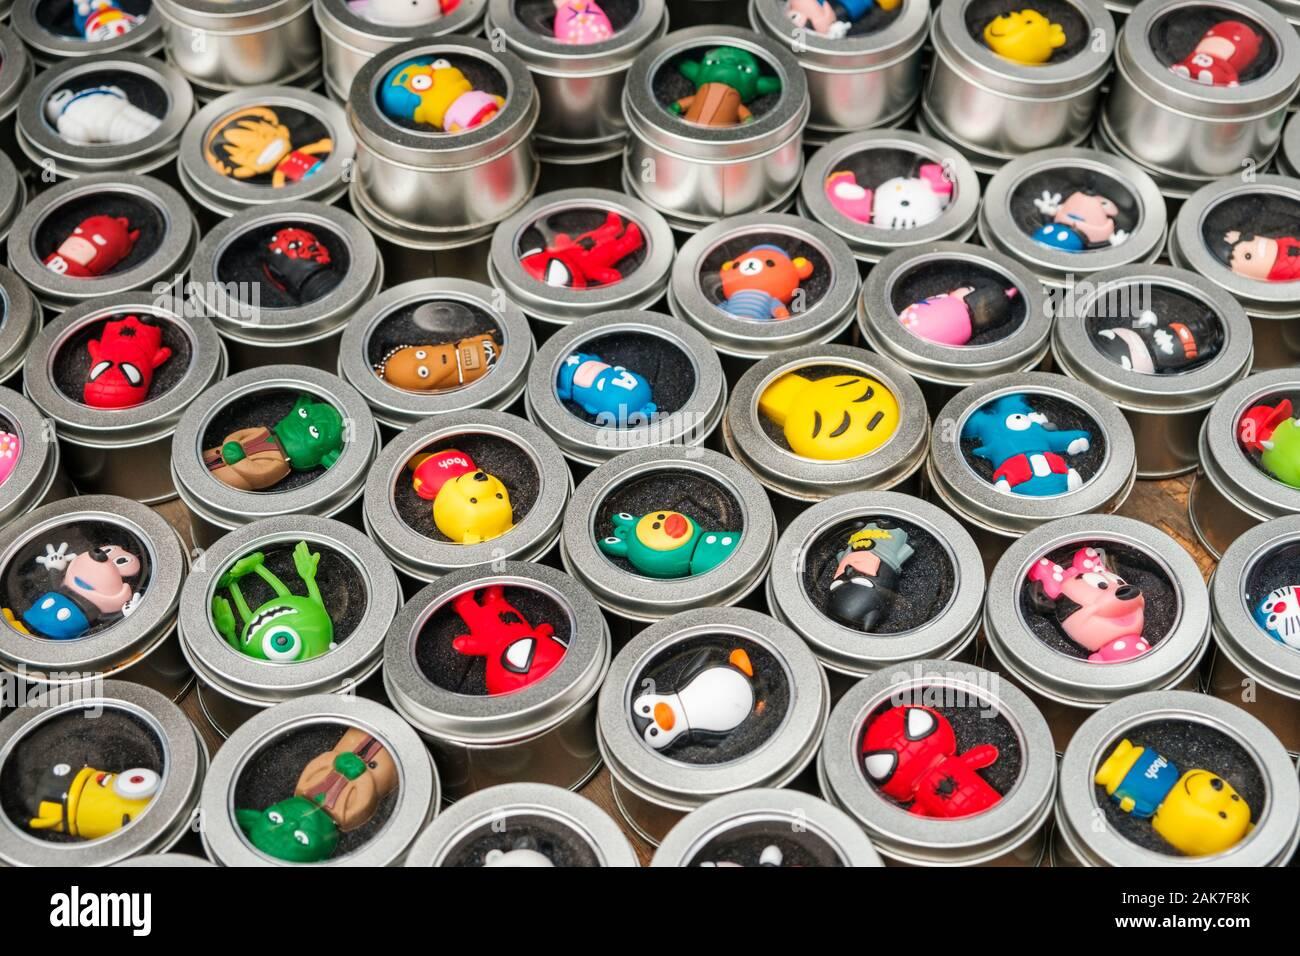 HongKong, China - November, 2019: Usb Stick with toy / cartoon / comic characters  on street market (Ladie`s Market) in Hong Kong , Tung Choi Street Stock Photo